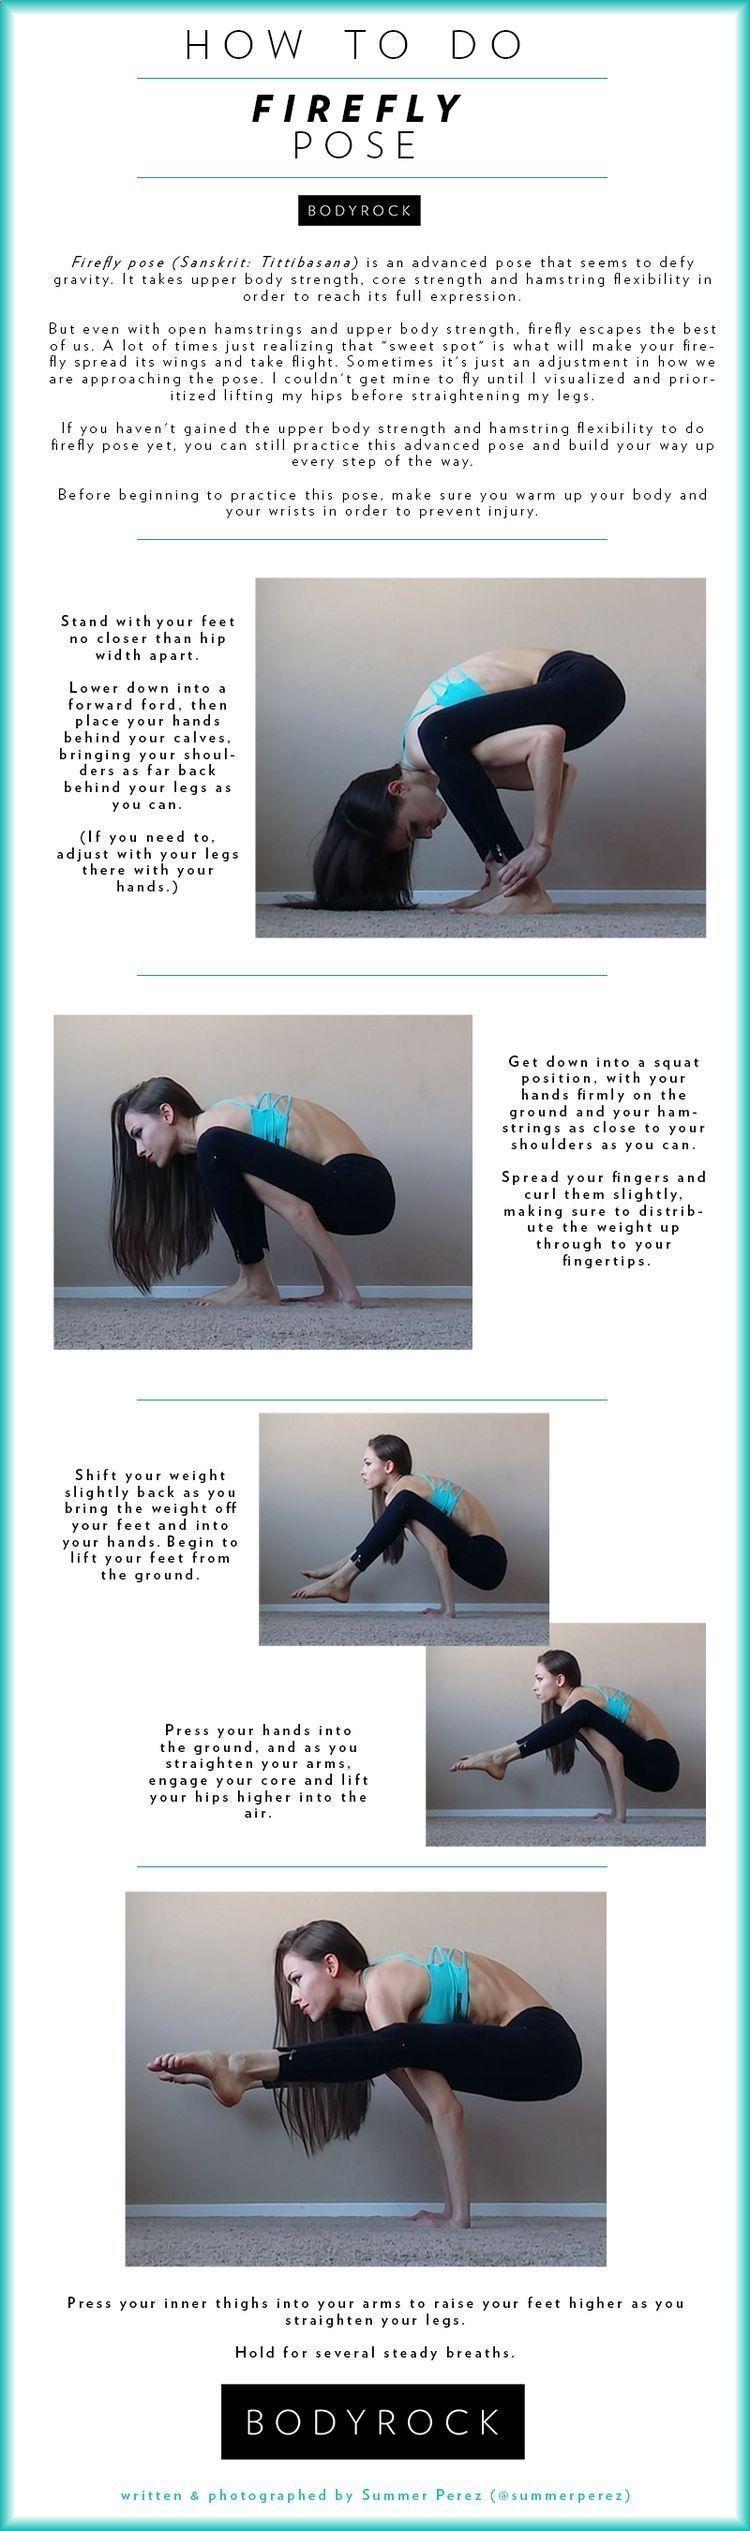 Best Yoga Position